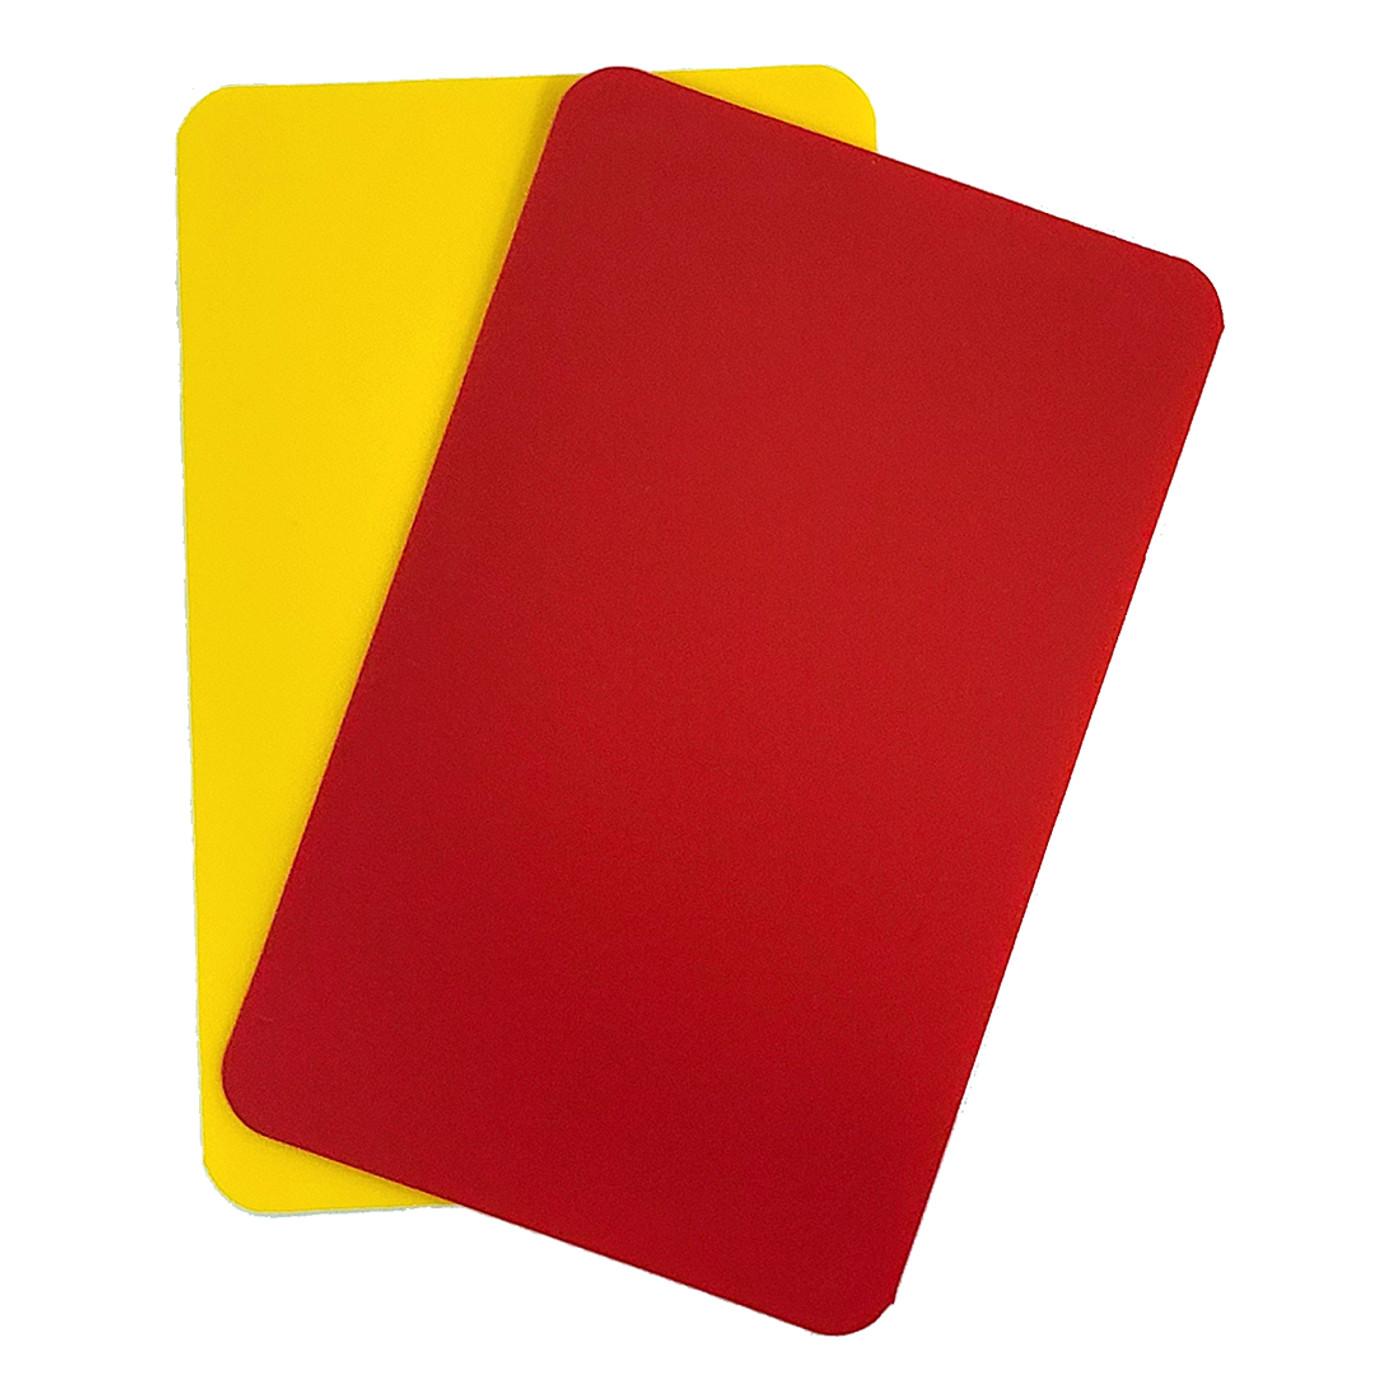 2041 Set Of 2 Pro Cards R/Y